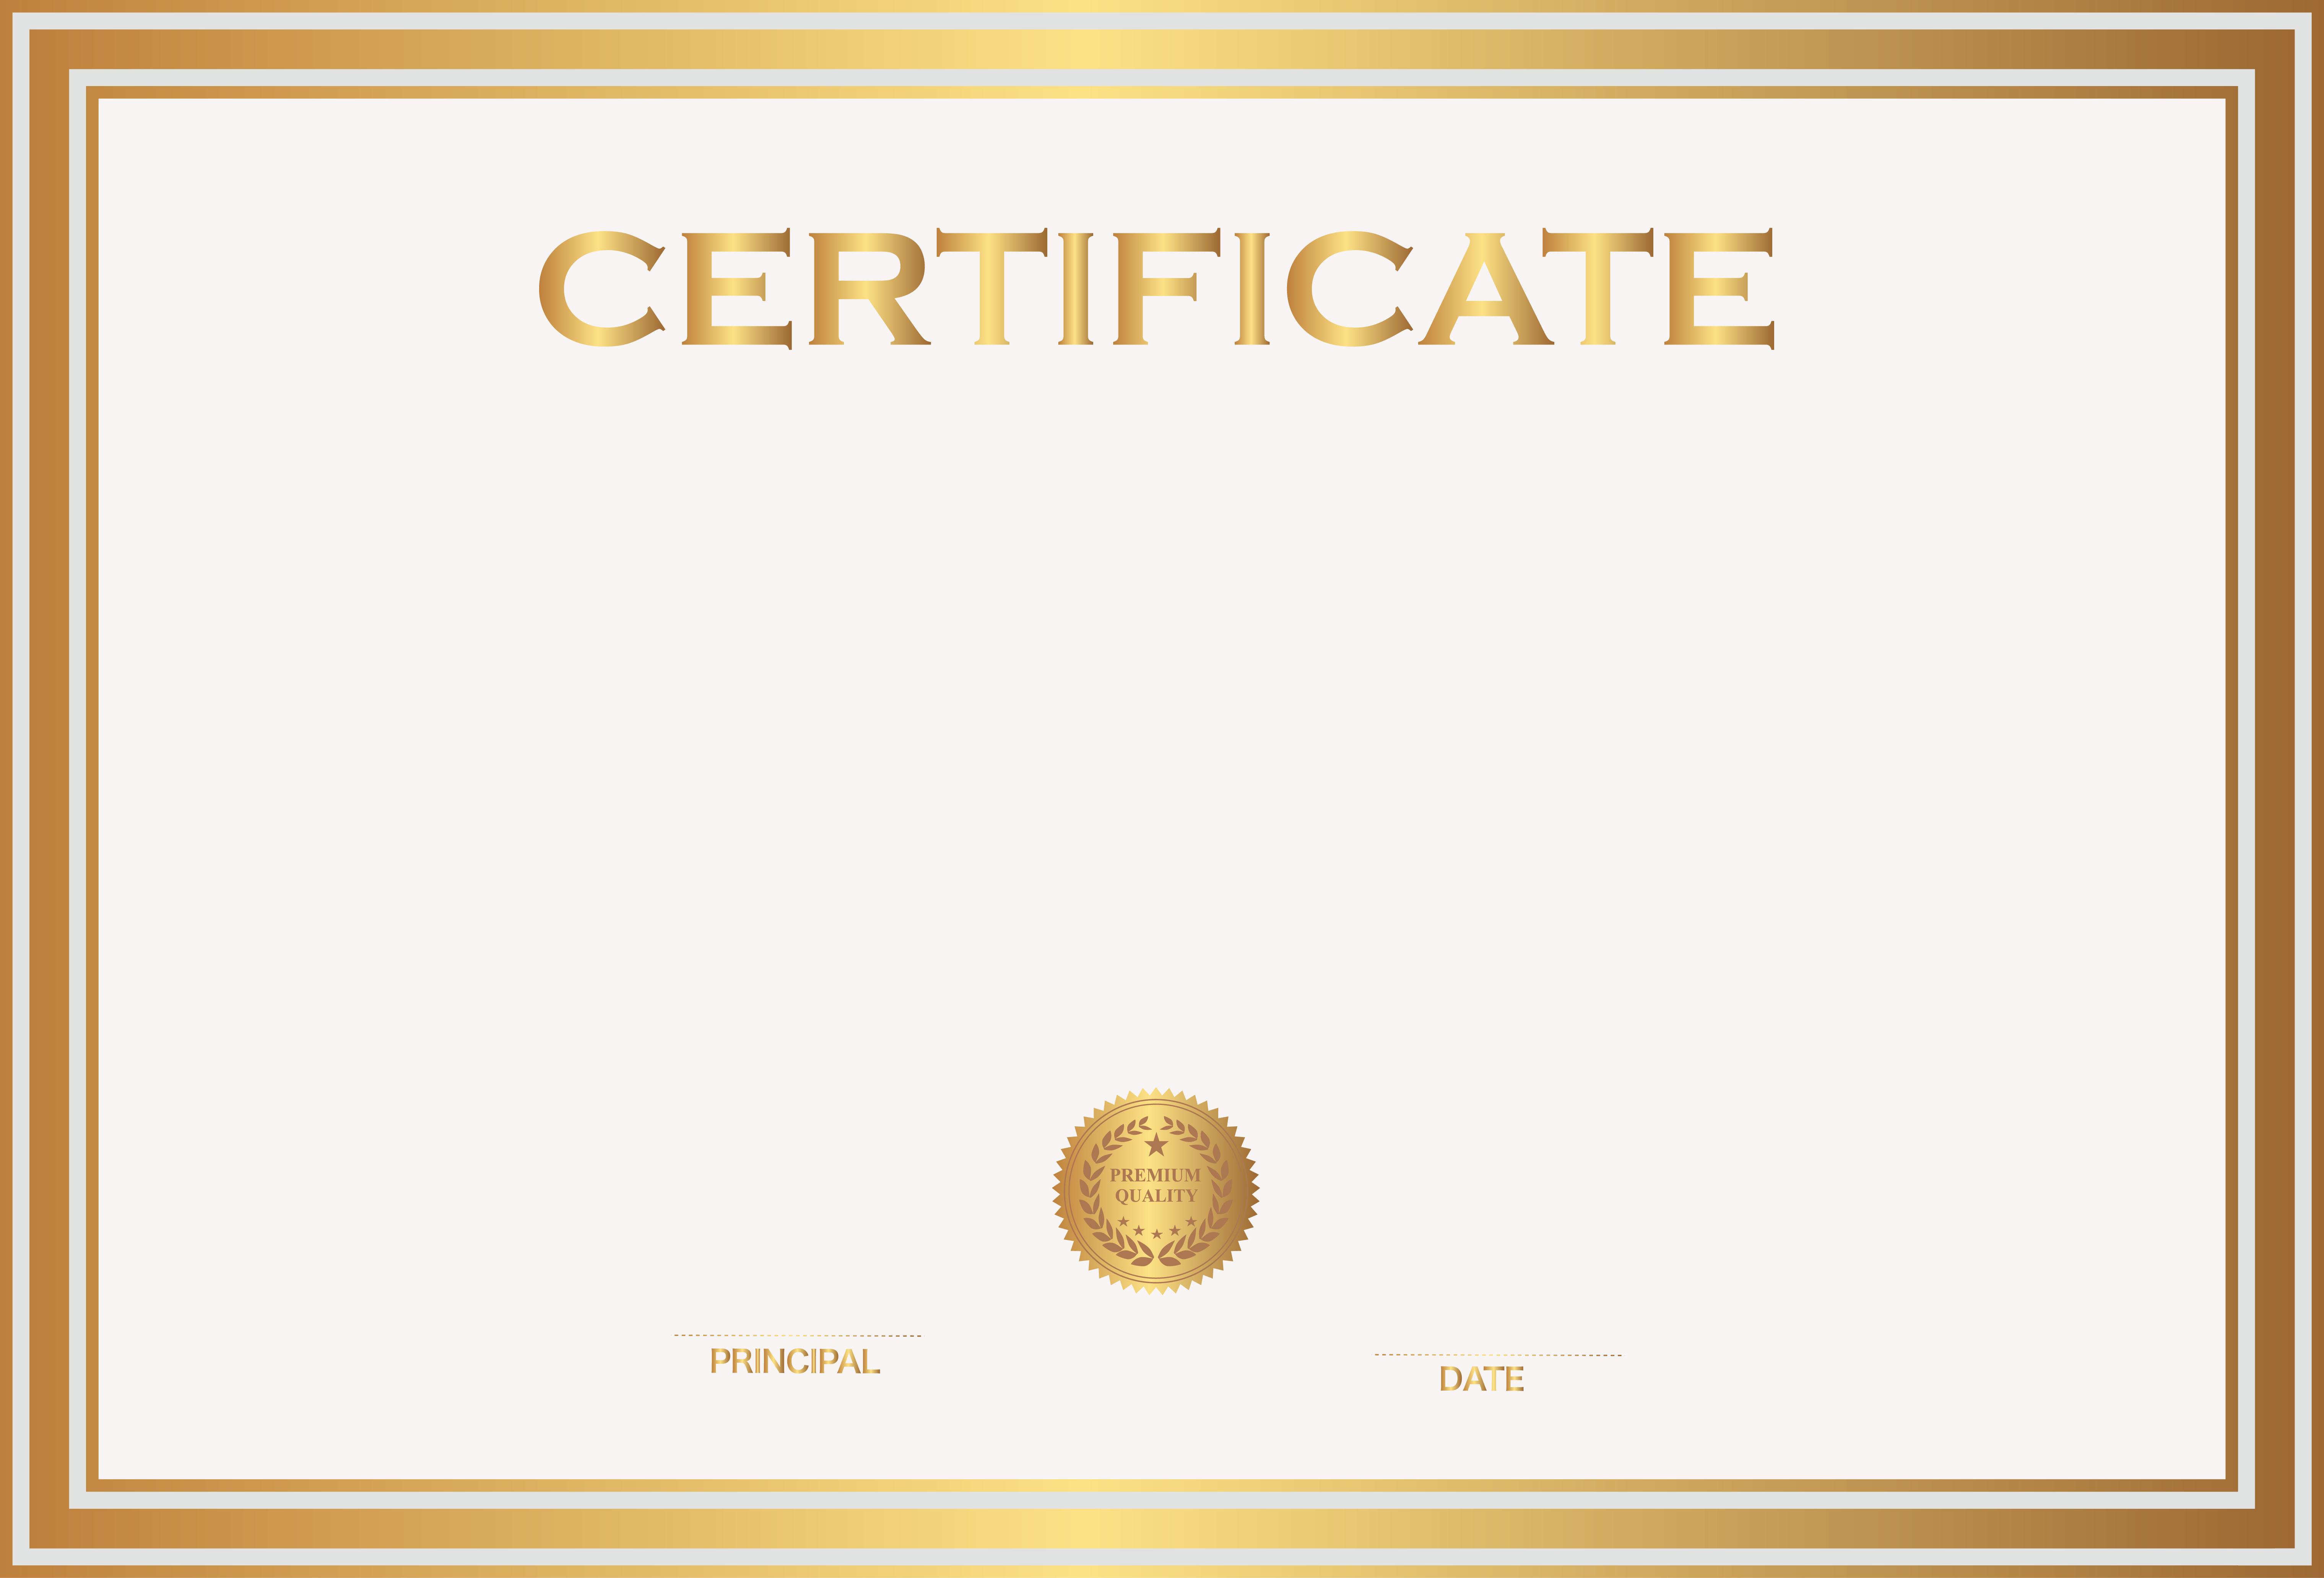 Free Online Certificate Maker software Elegant Certificate Template Png Transparent Certificate Template